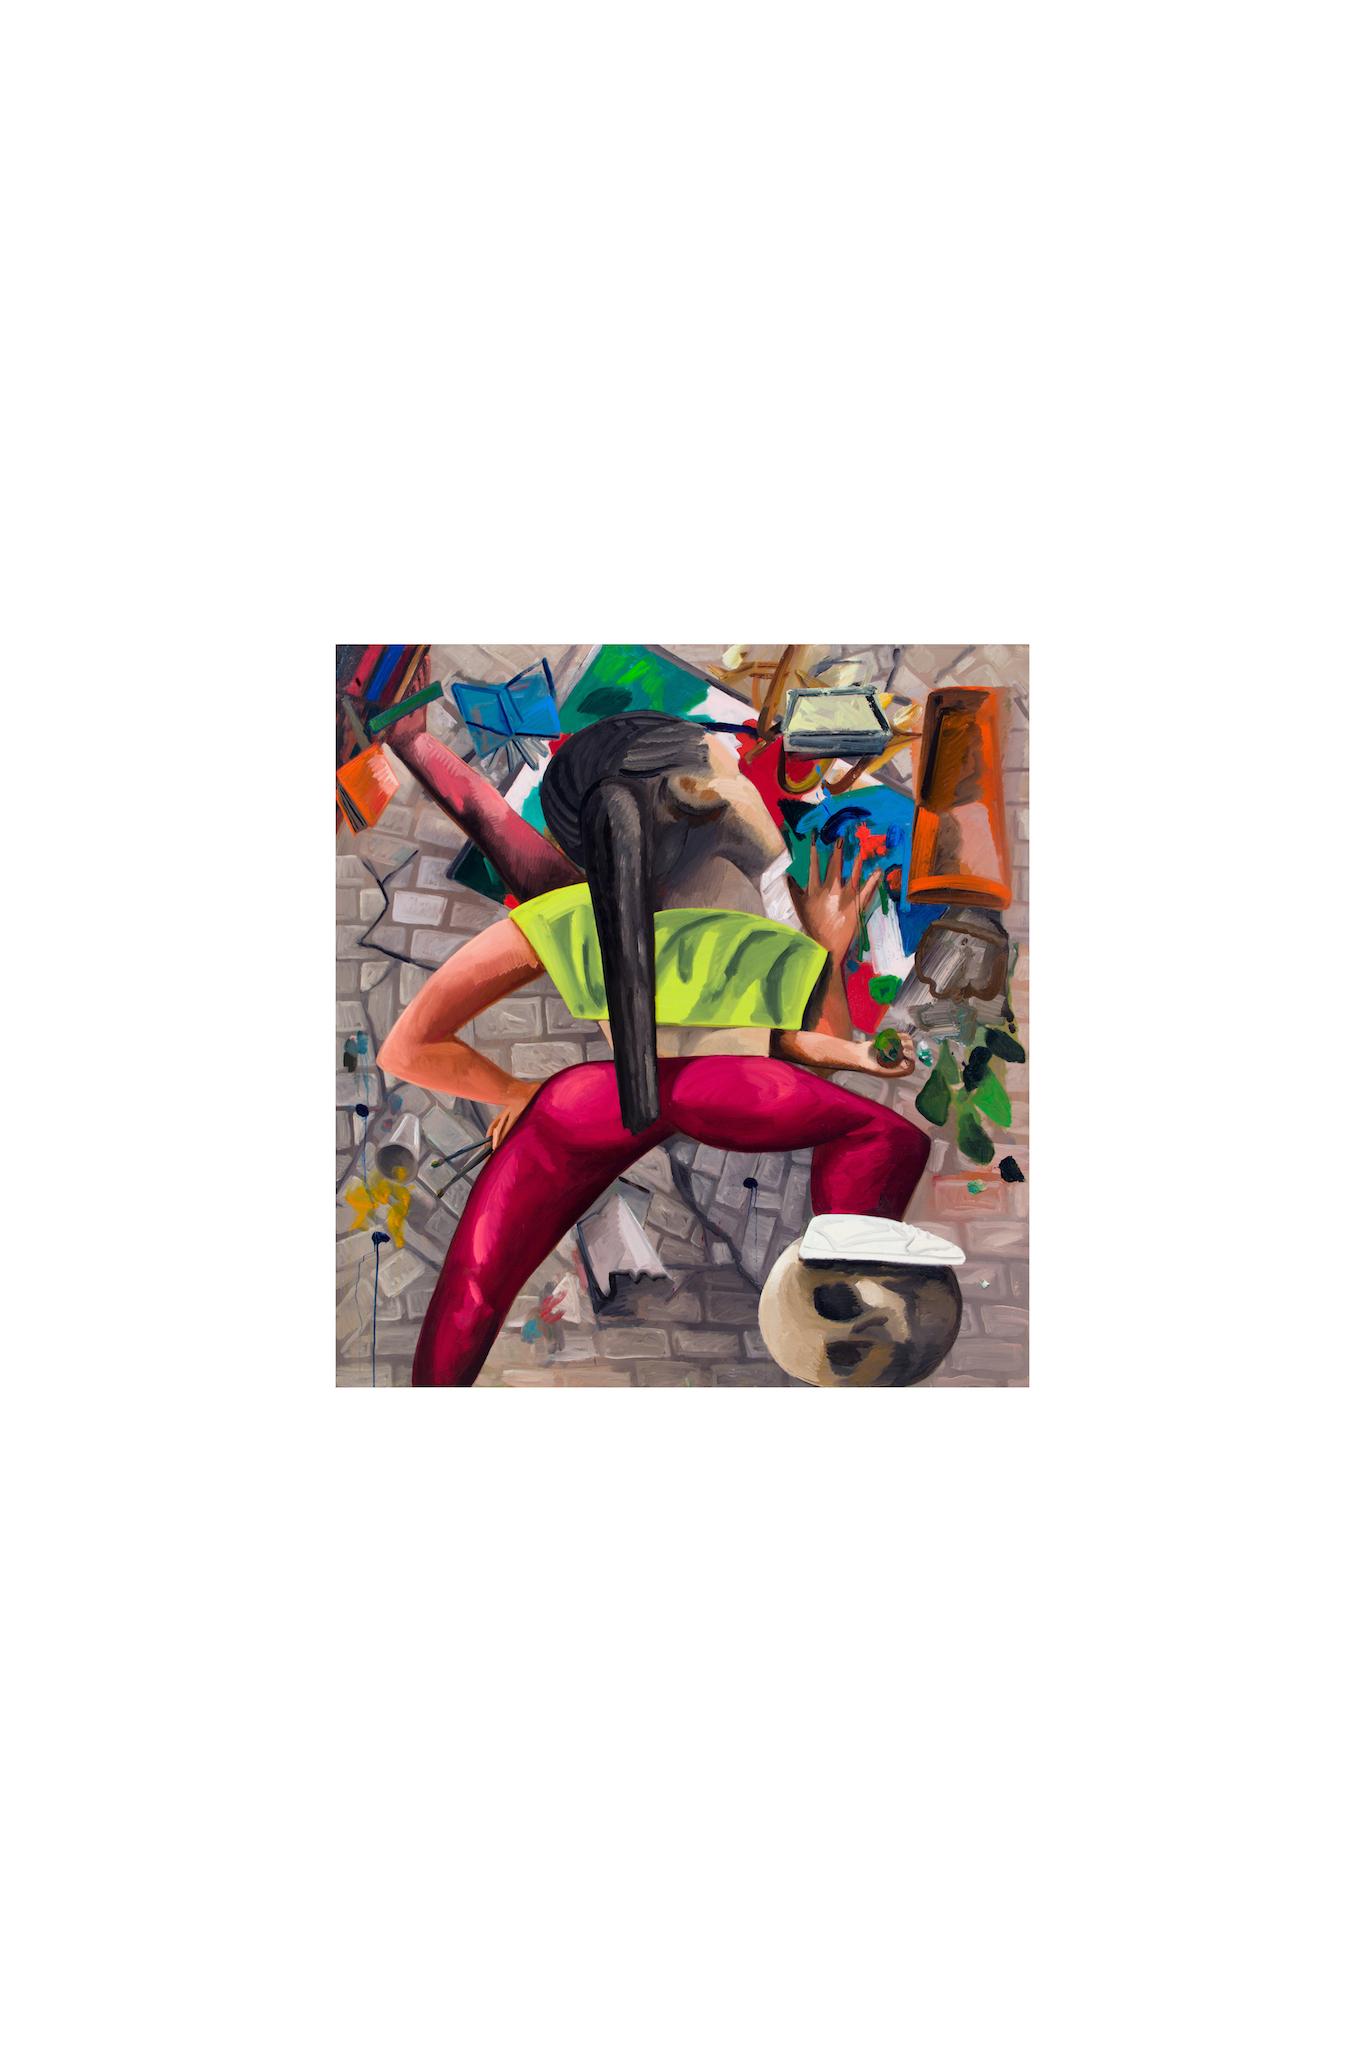 Dana Schutz, Painting in an Earthquake, 2019